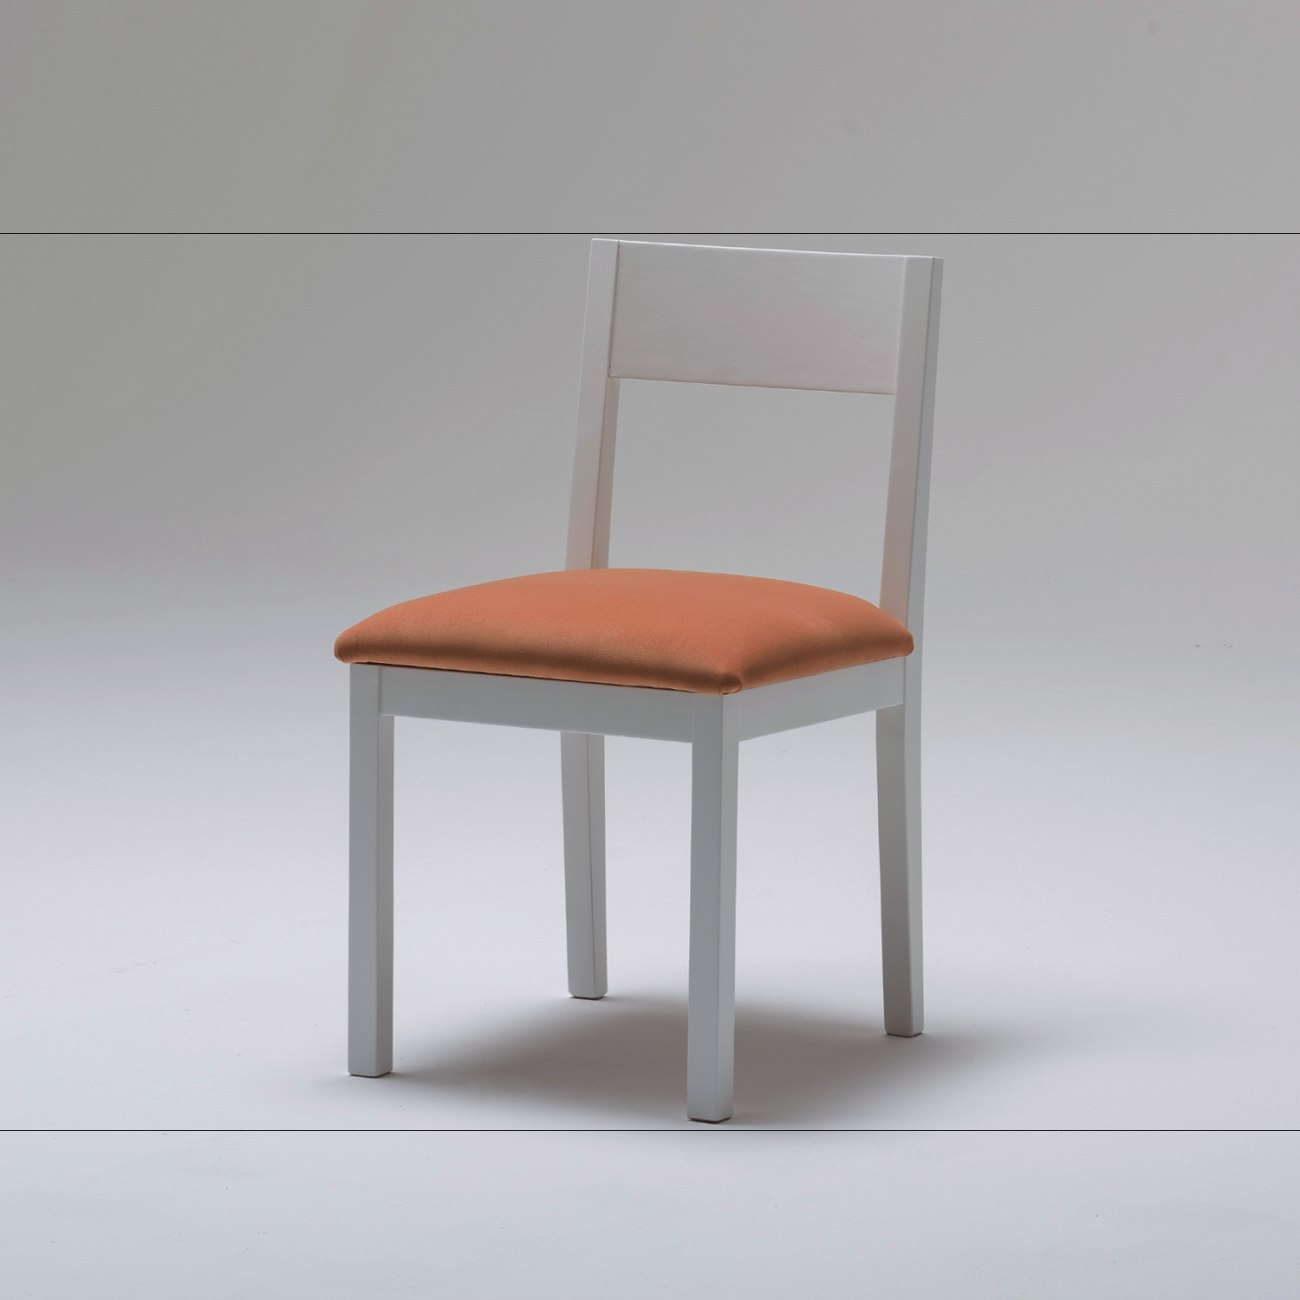 sandalye_dunyasi_mobilyacini_sn_mobilya_fold_beyaz_sandalye (3)